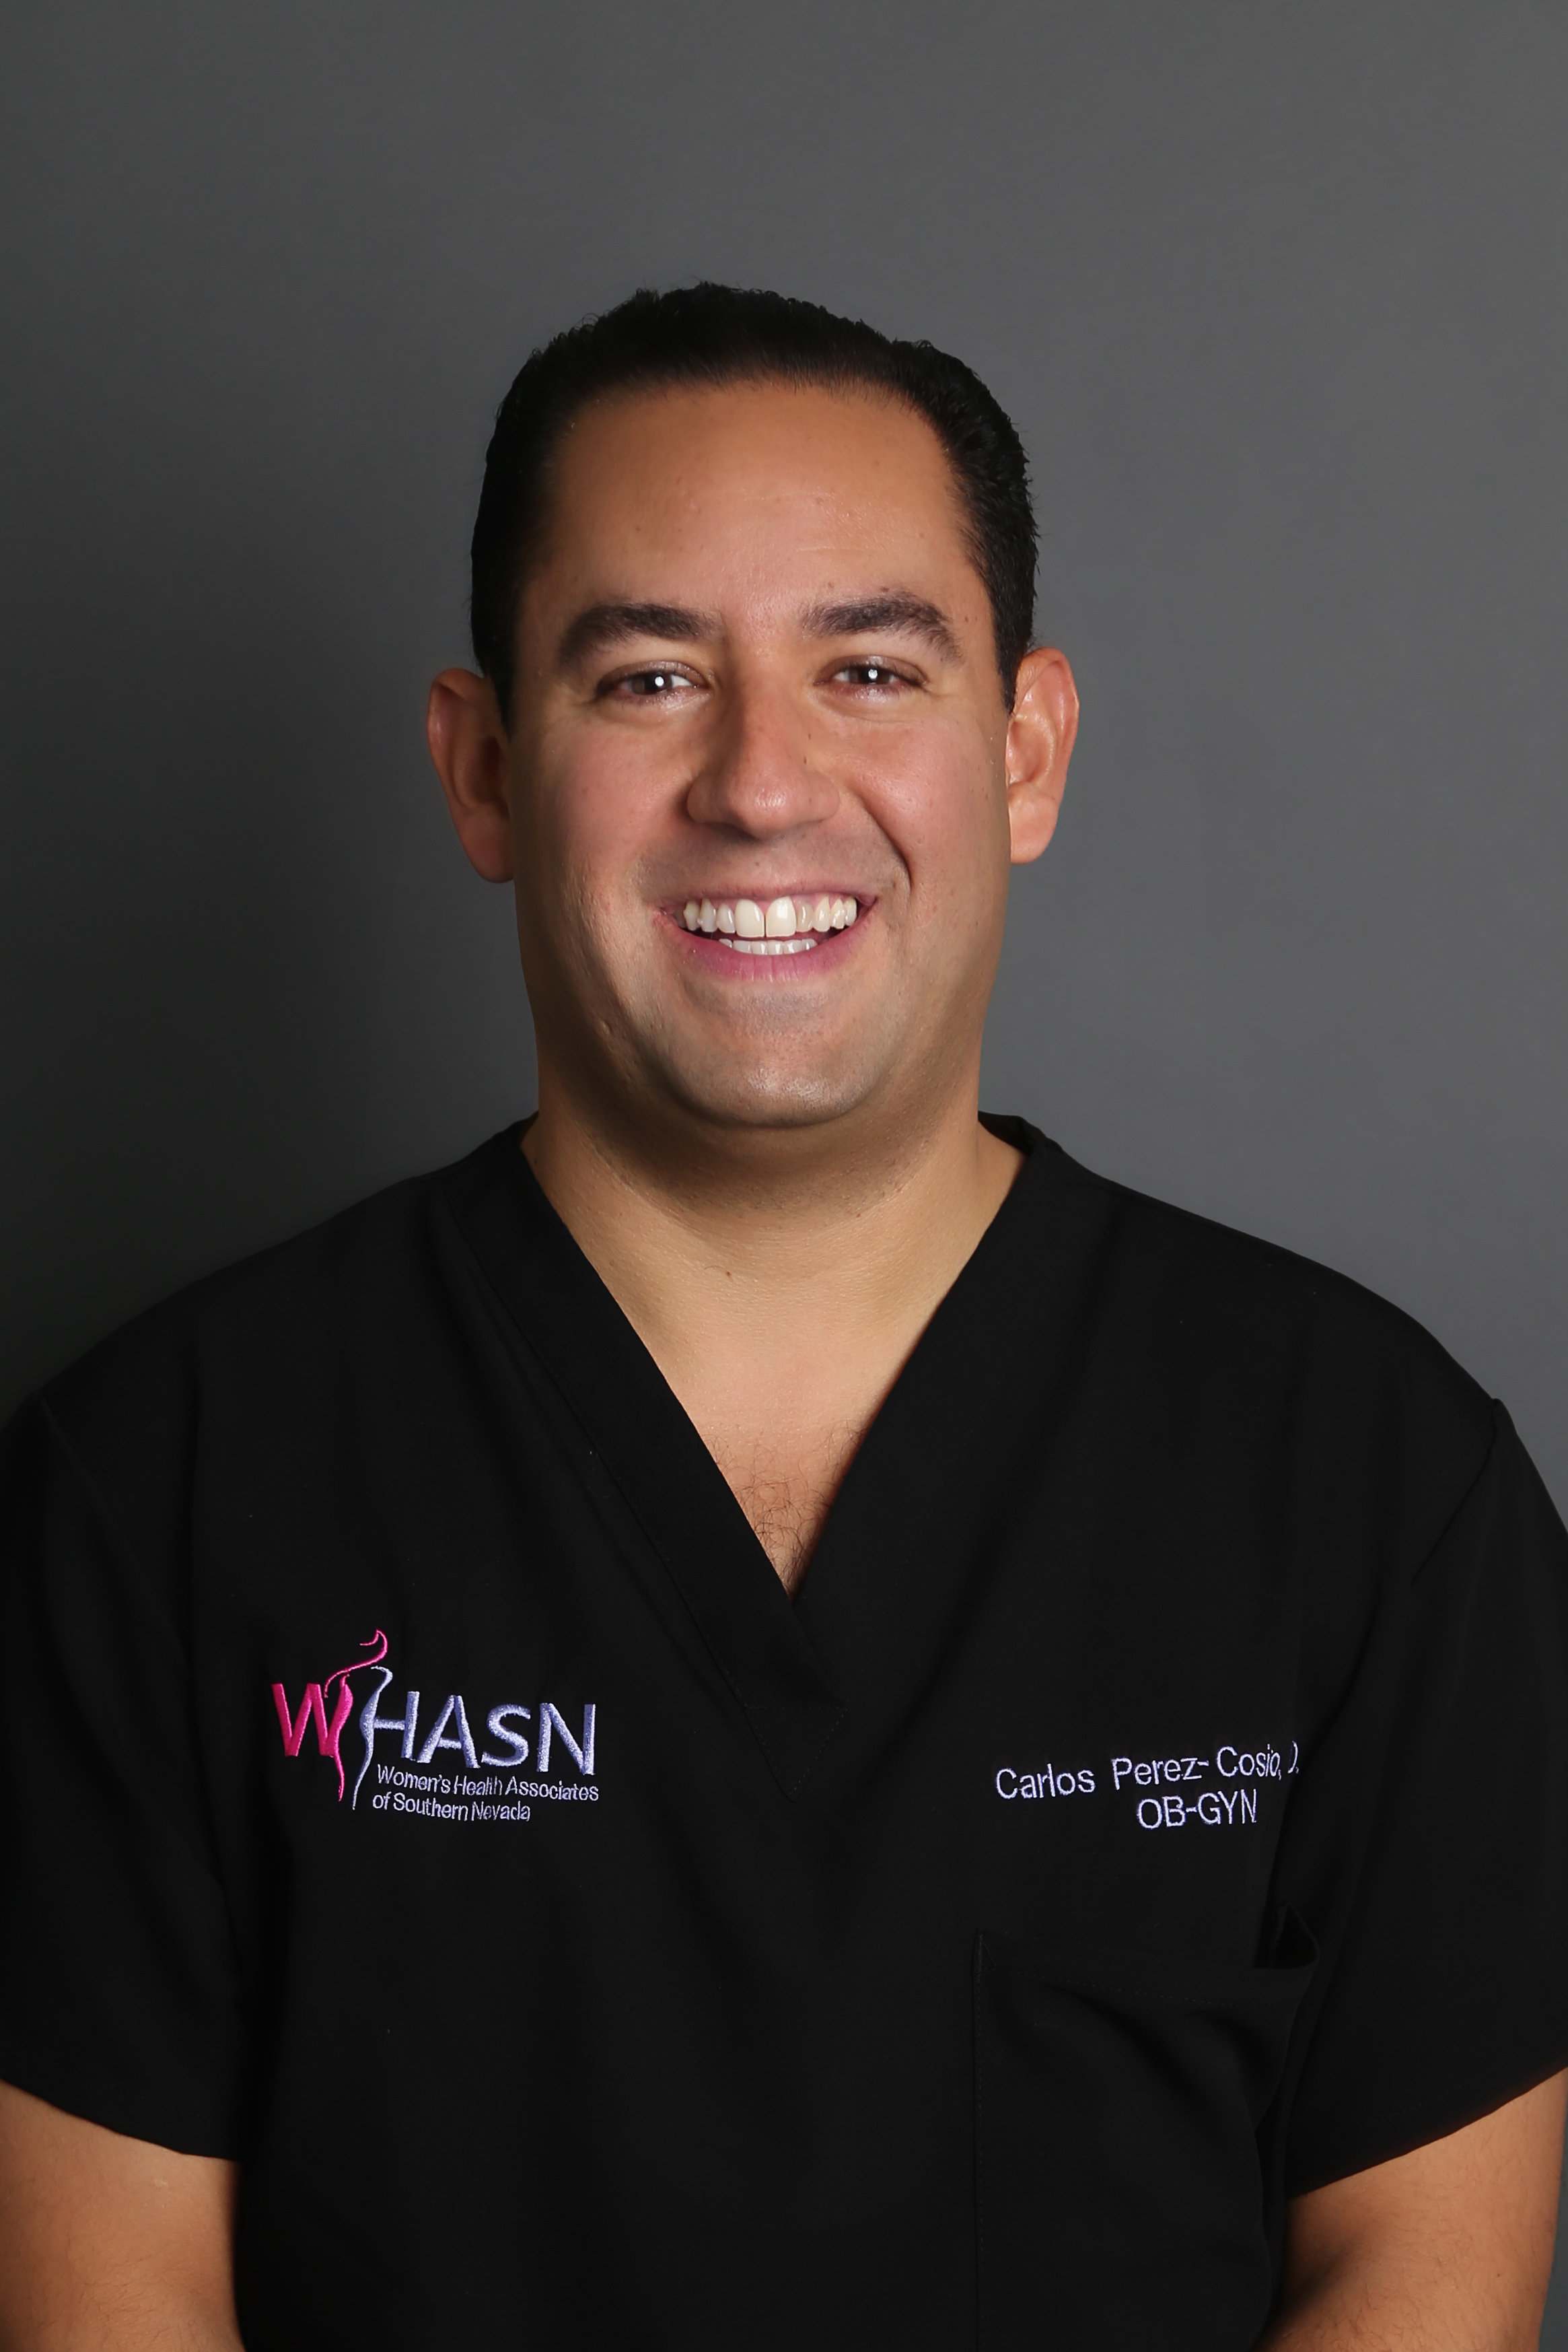 Obstetrician Gynecologist Carlos Perez-Cosio